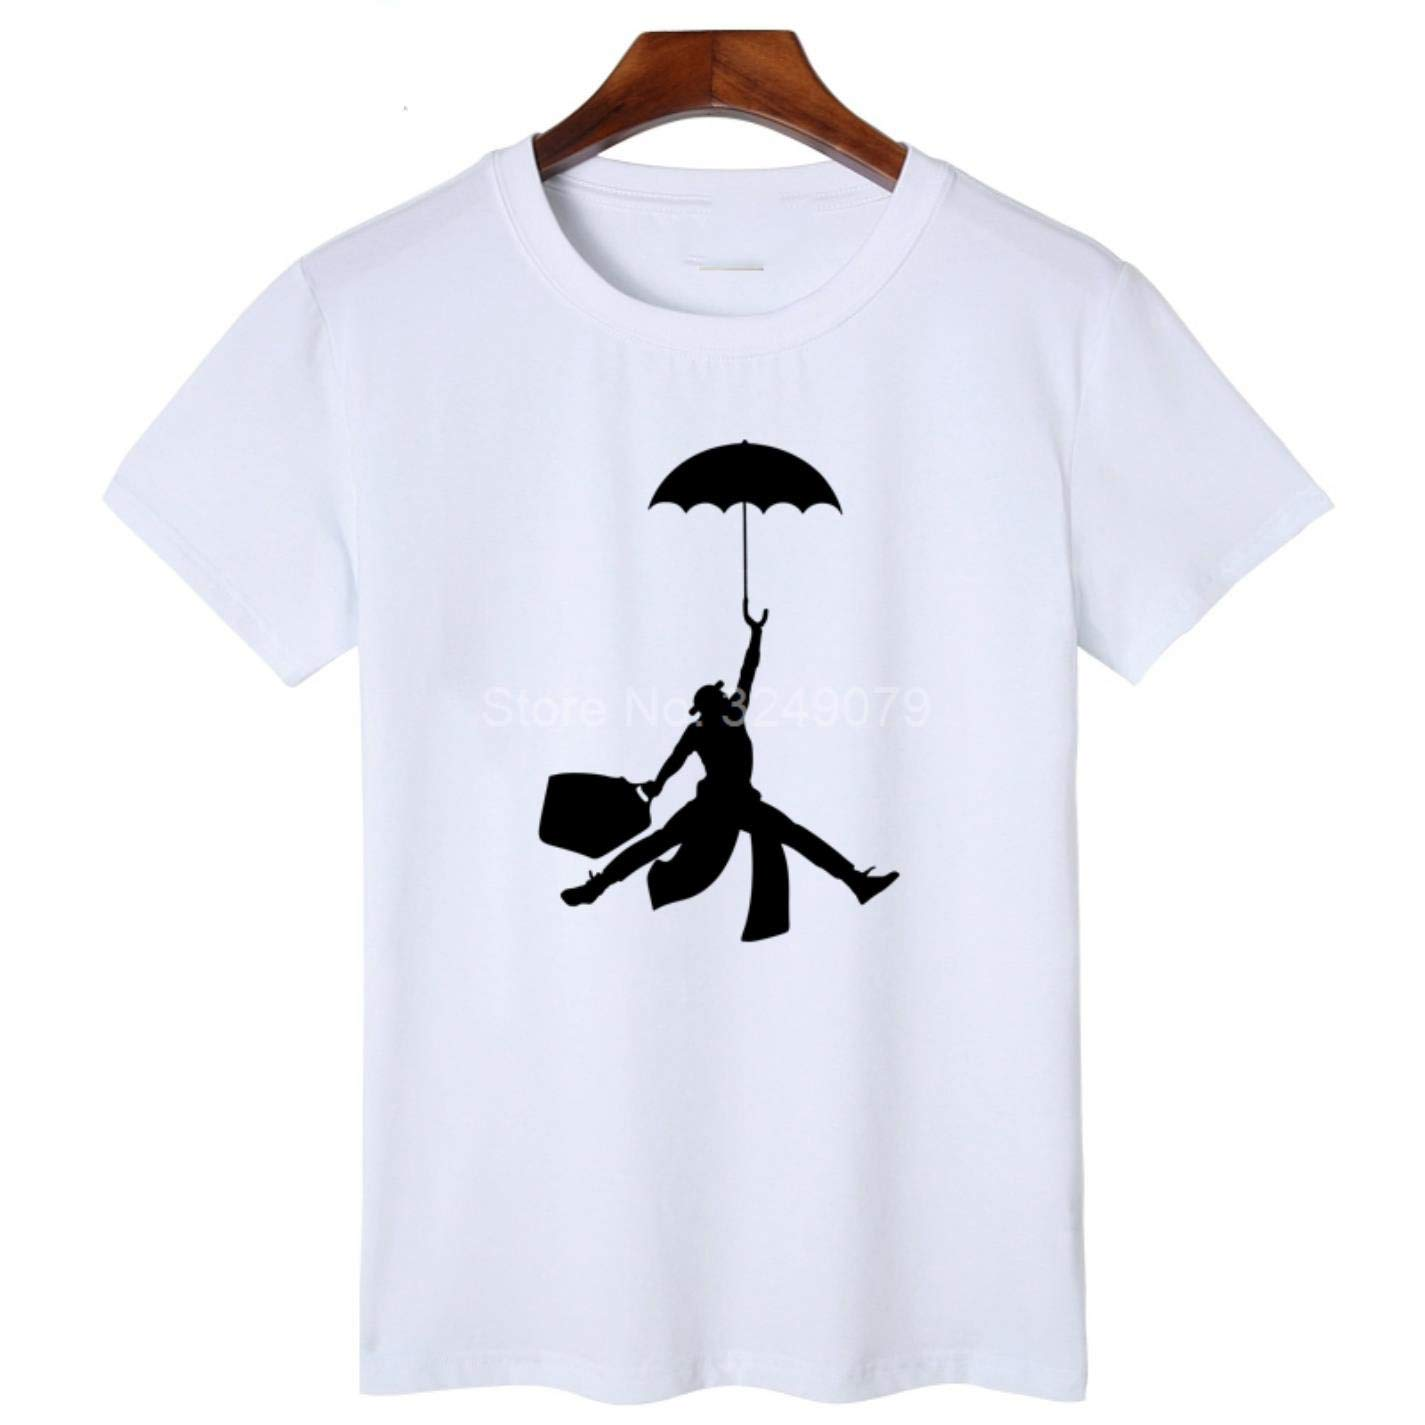 Amazon.com: Style Men T-Shirt Clothing Cotton Saiyan Brothers Manga Goku T-Shirts: Clothing